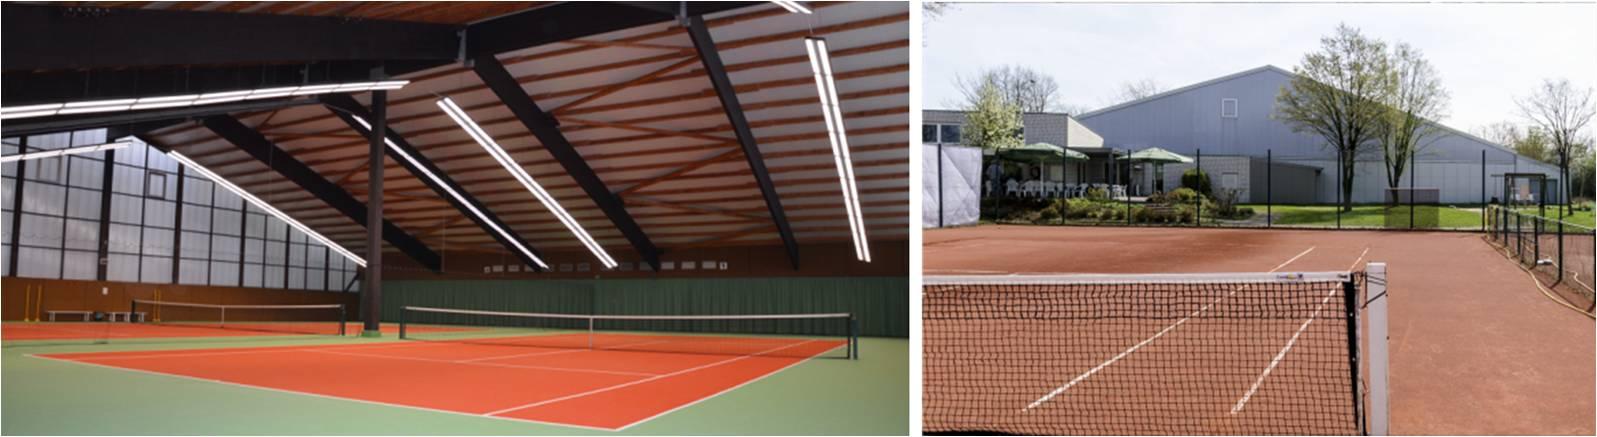 LED Distribution | Projects | Indoor Tennis Center (TC Havixbeck e.V.) | Havixbeck, Germany